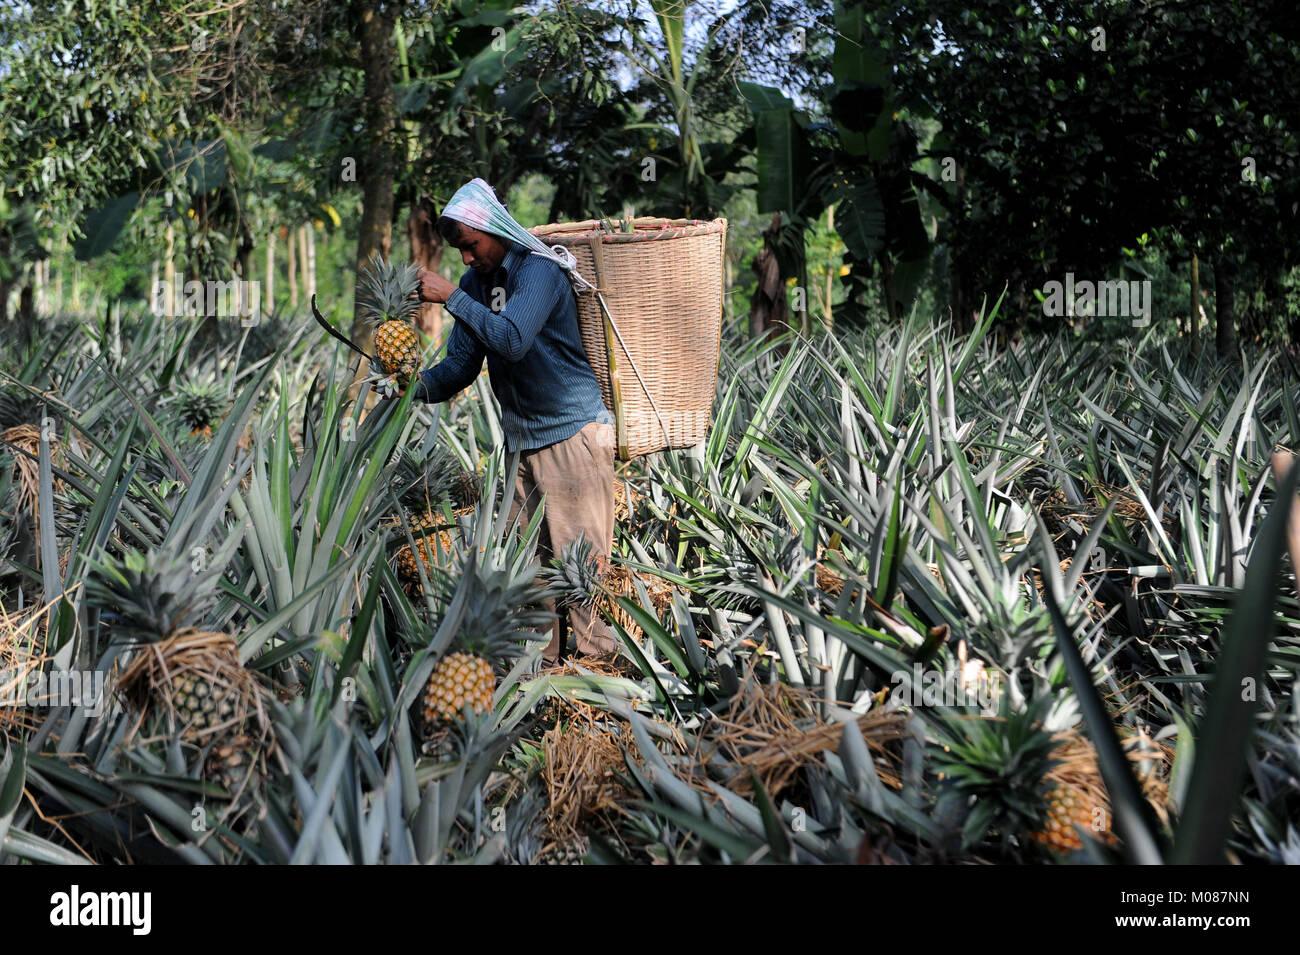 TANGAIL, BANGLADESH – JUNE 25, 2016: Pineapple plant harvest at Madhupura in Tangail, Bangladesh. - Stock Image